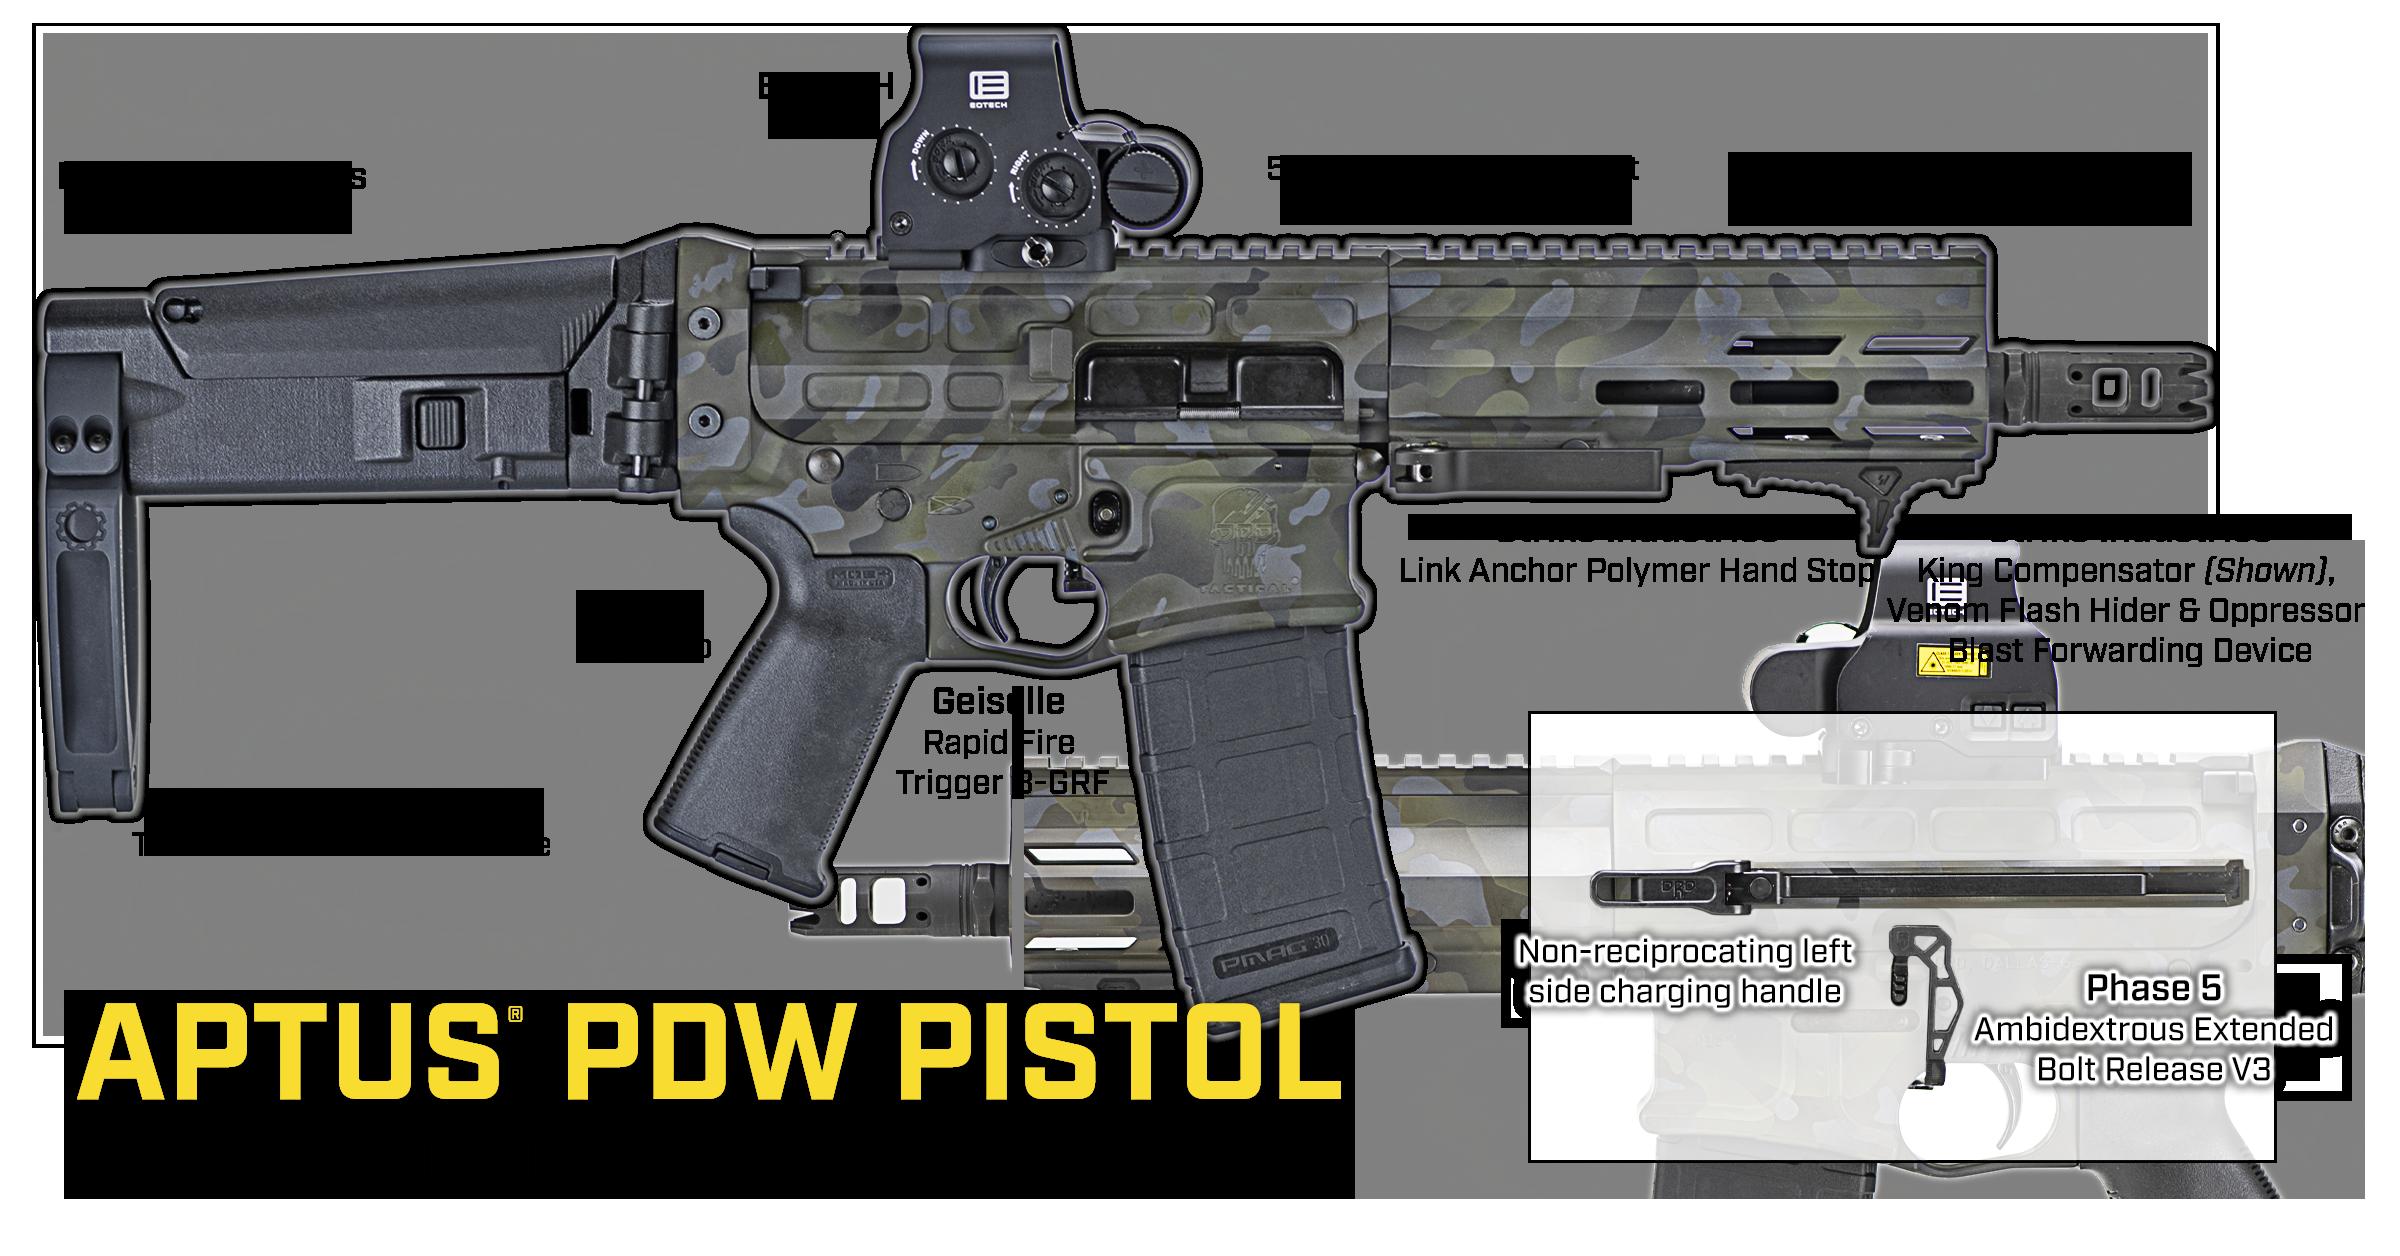 promo-aptus-pistol-oct2020-website-details-aptus-pdw.png